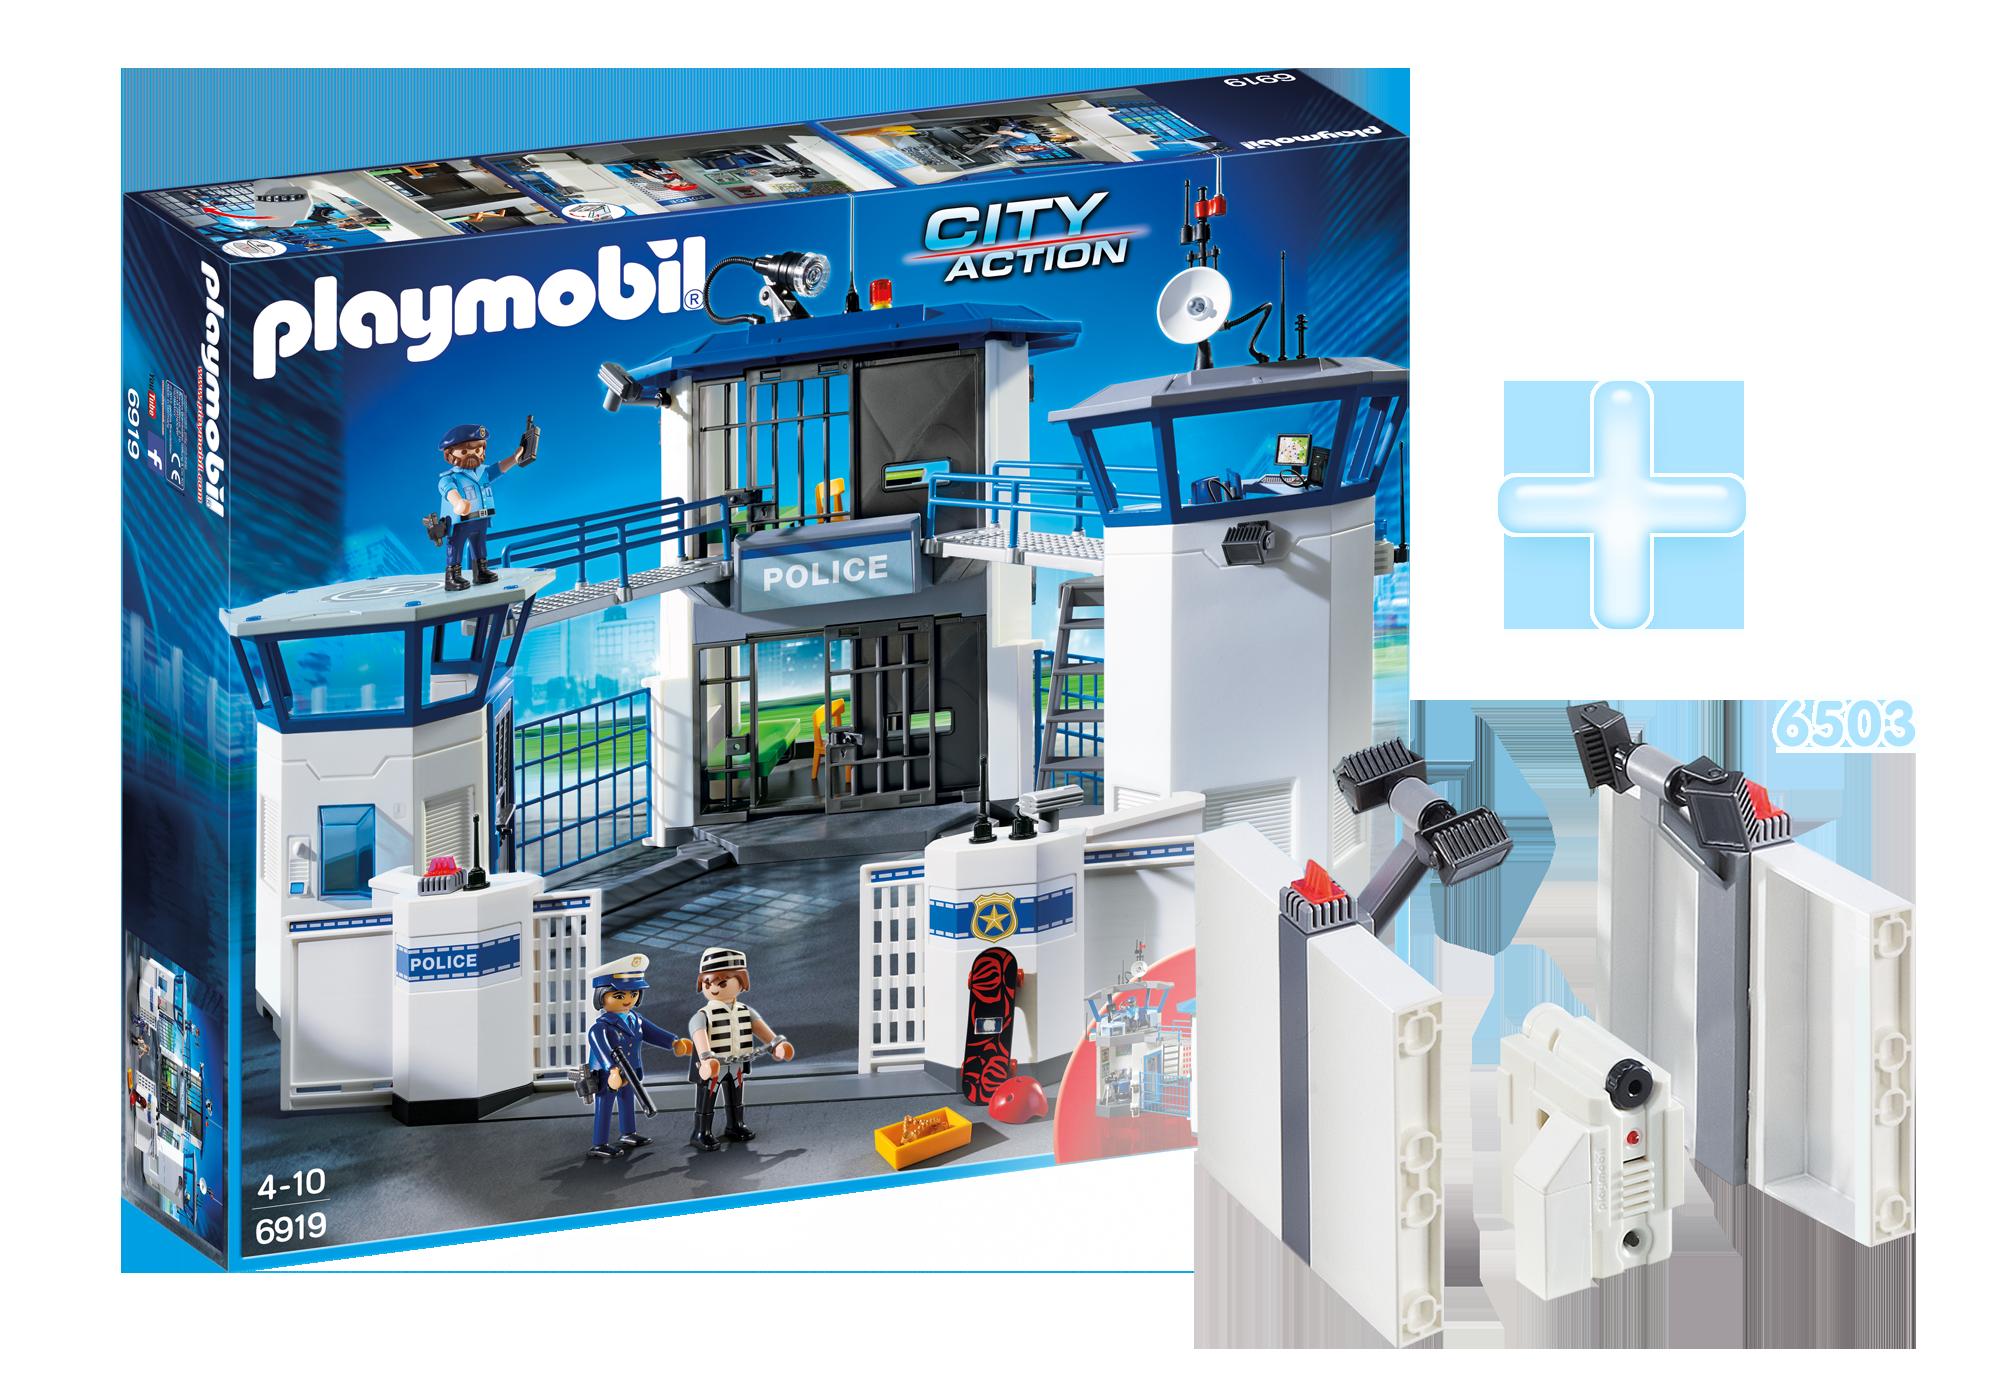 http://media.playmobil.com/i/playmobil/FR1810A_product_detail/Police Station Bundle